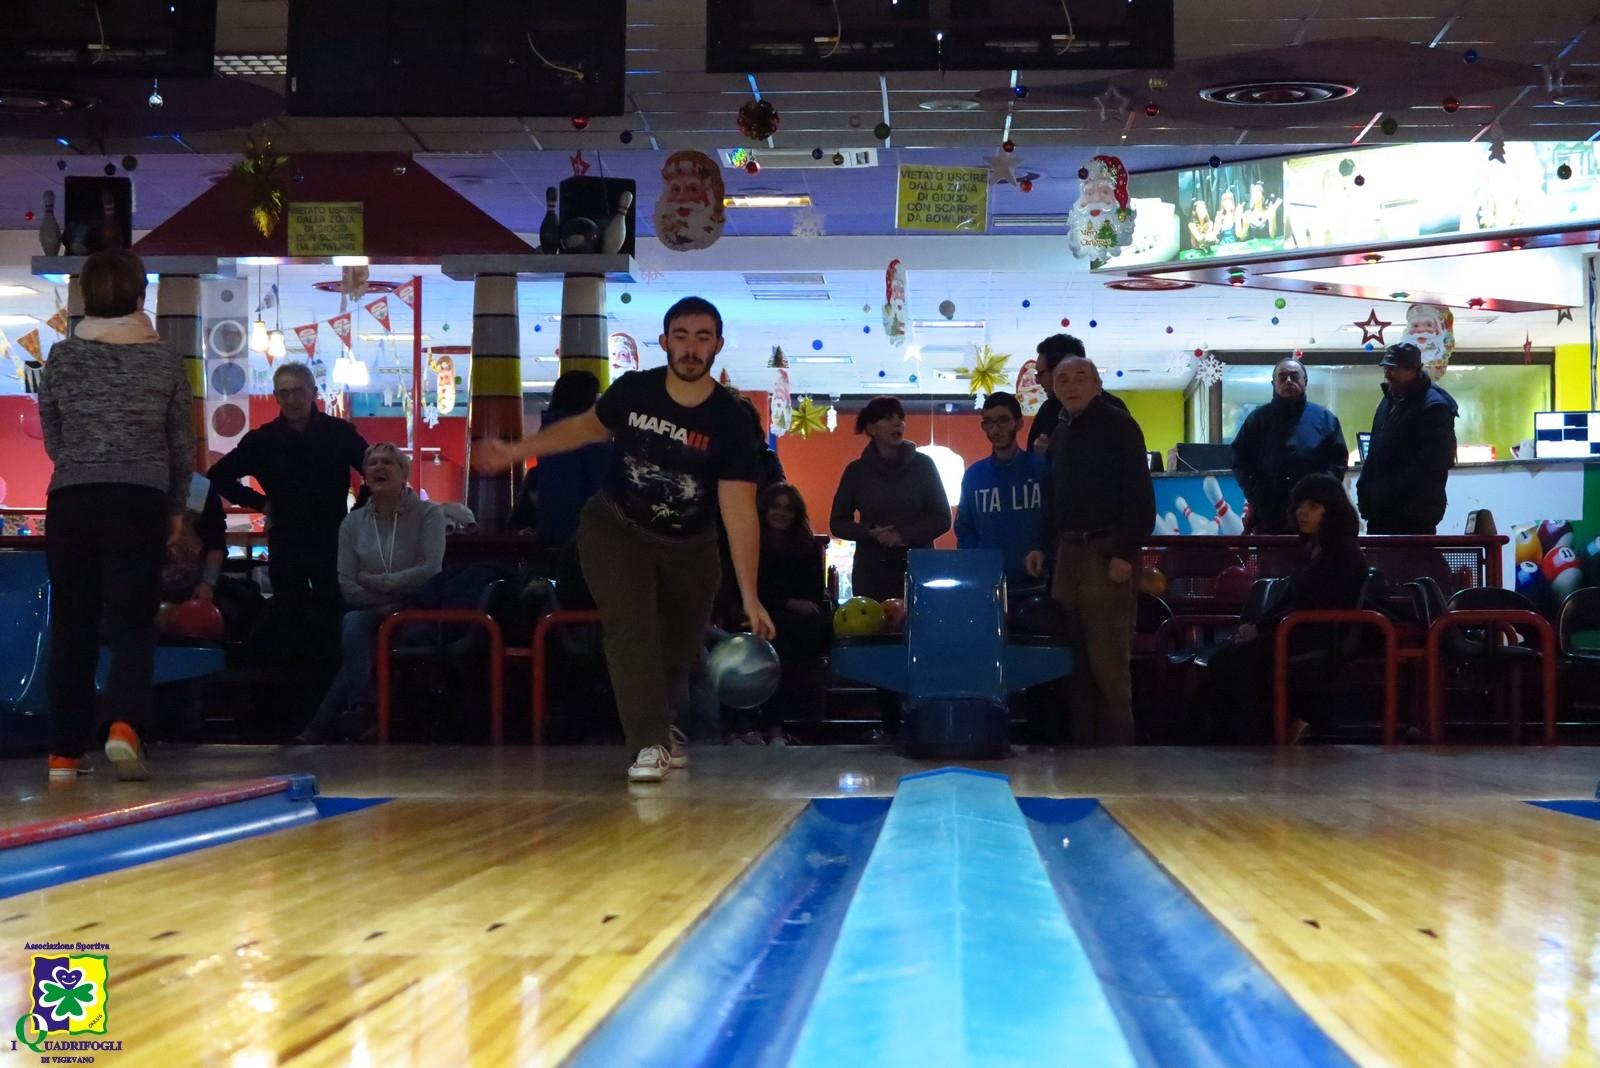 Torneo Bowling Vigevano 19-12-2018 - 023